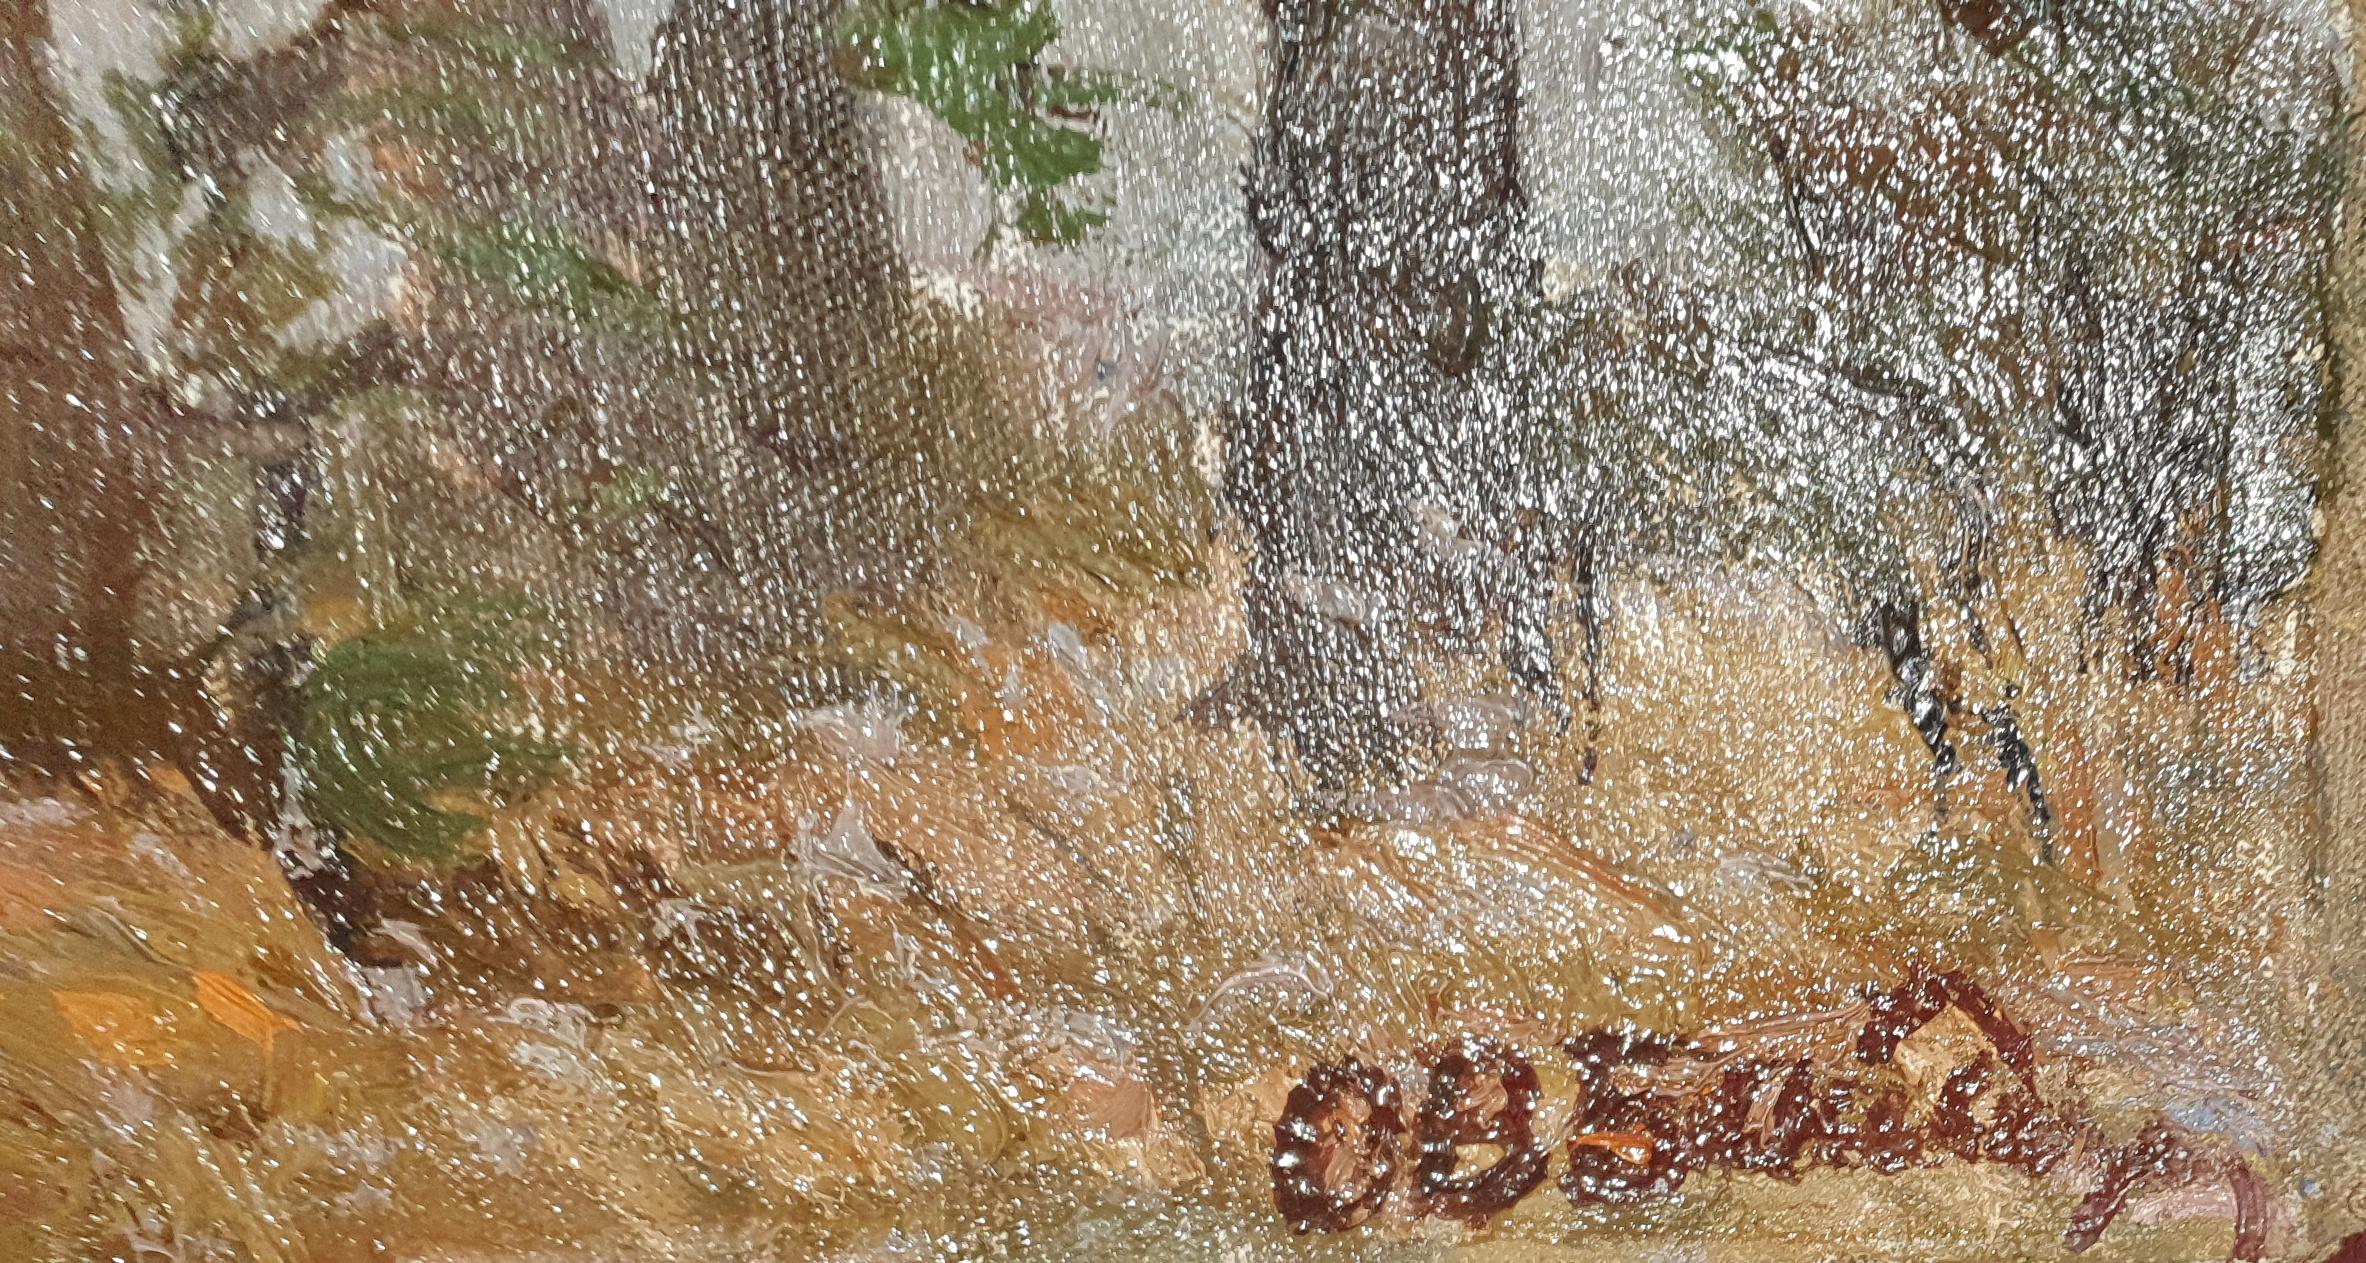 Озеро Дружби 44-80 см., холст, масло - 1